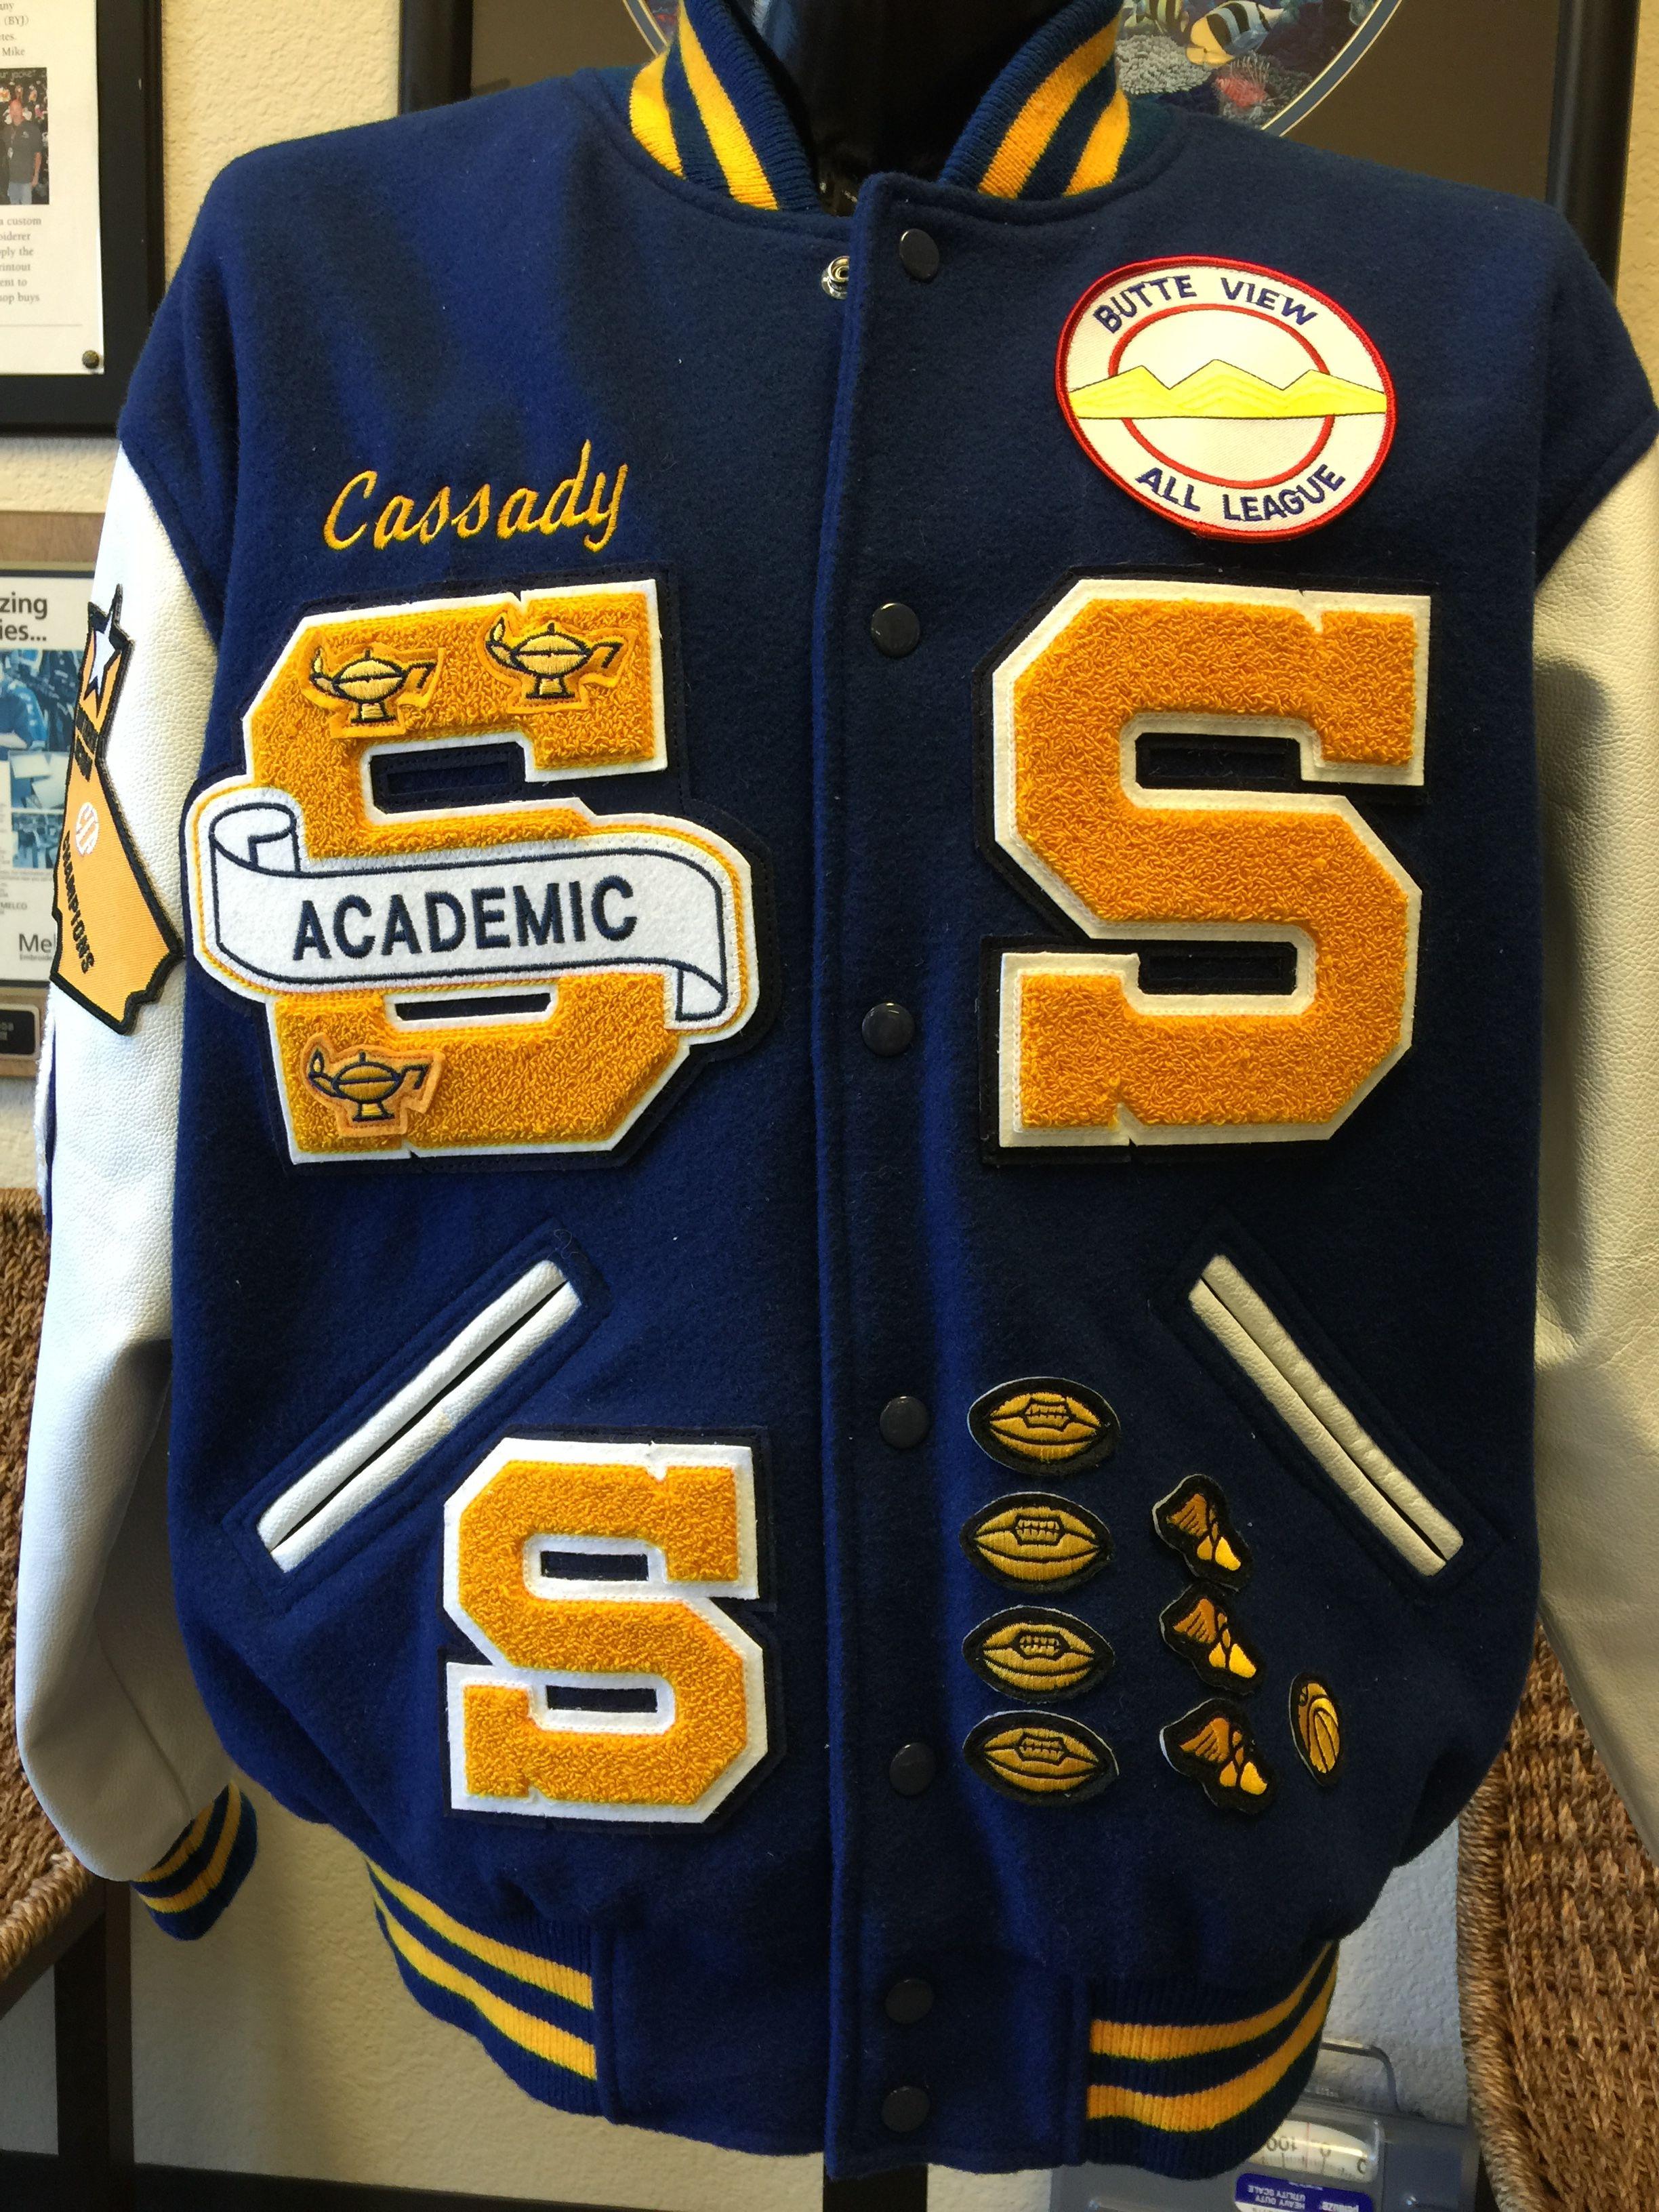 Pin By Mike Doyle On Sutter Union High School Huskies Varsity Letterman Jackets Varsity Jacket Men Varsity Letterman Jackets High School Letterman Jacket